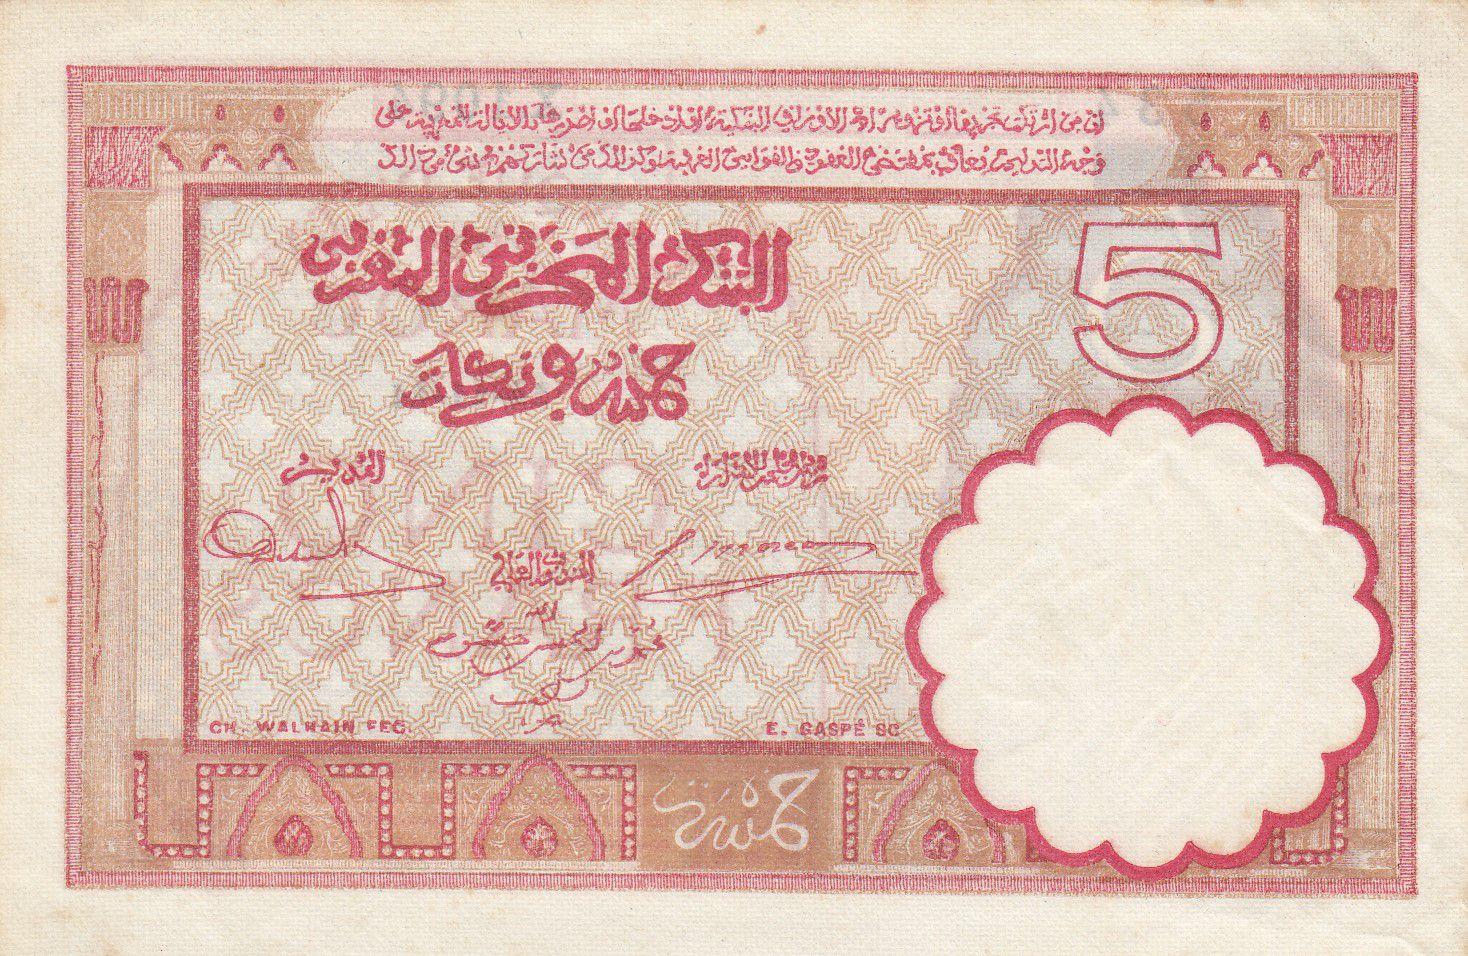 Maroc 5 Francs 14-11-1941 - TTB - Série X.1094 - P.23Ab